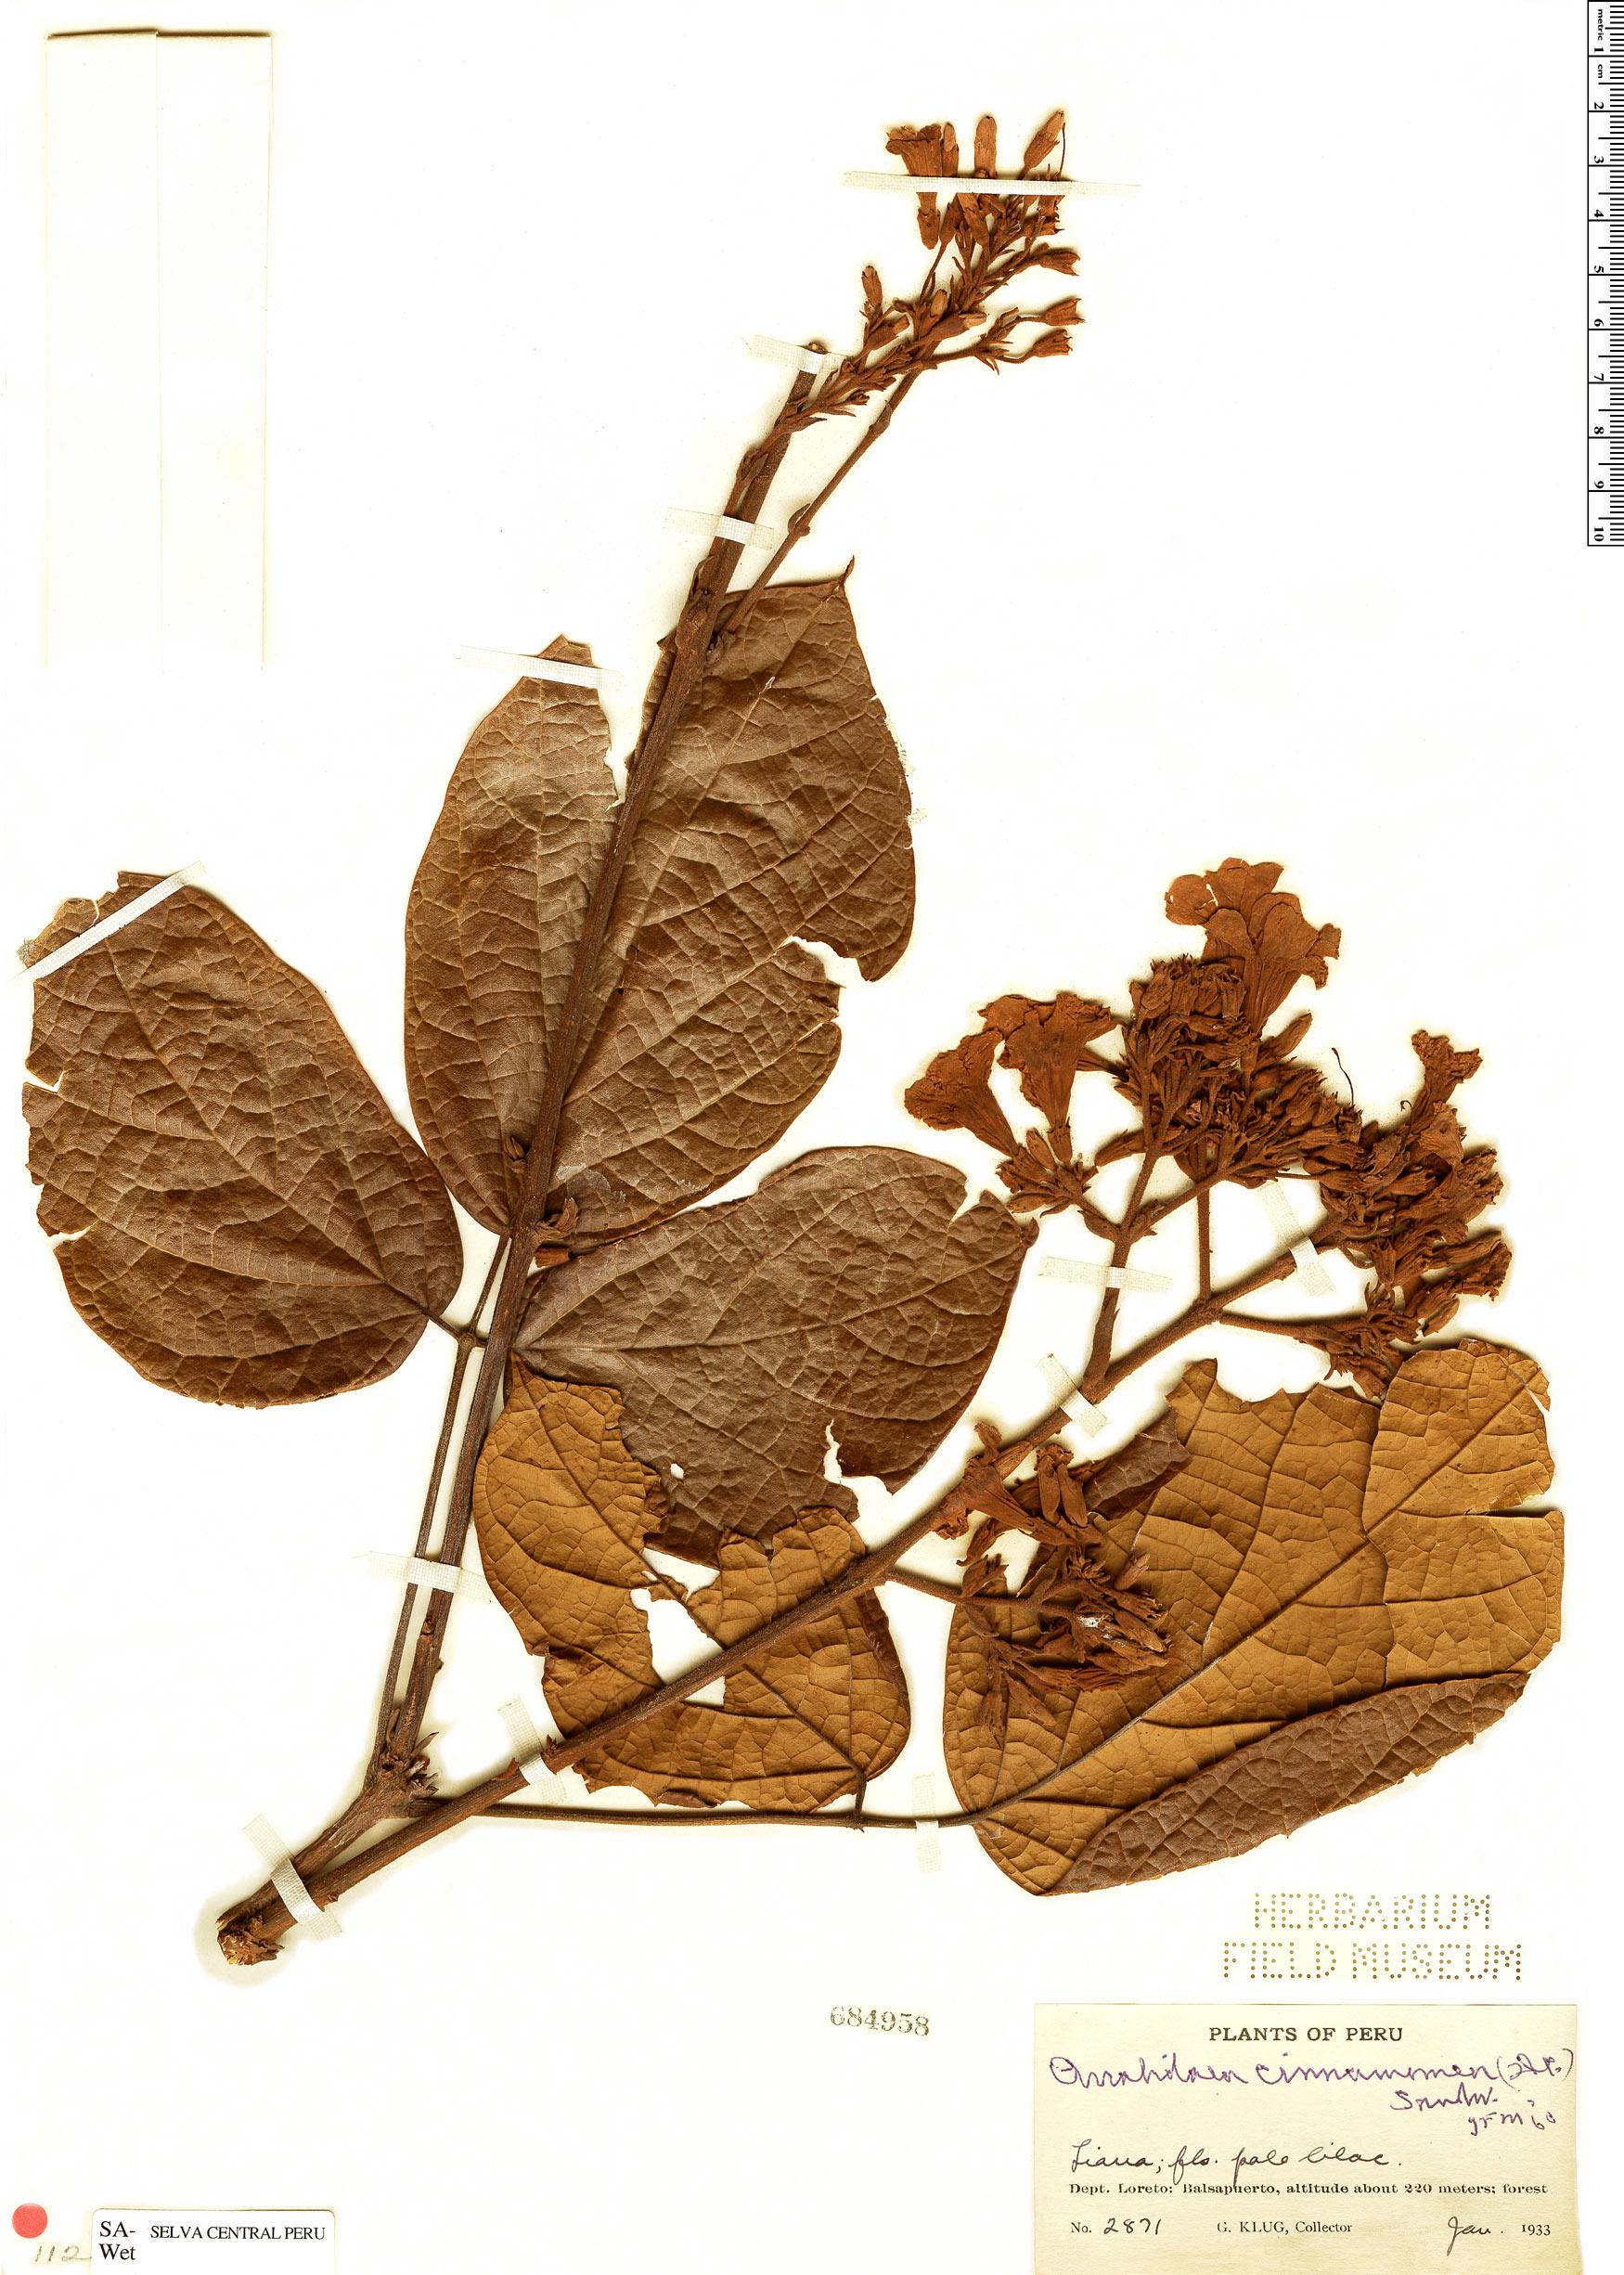 Specimen: Fridericia cinnamomea